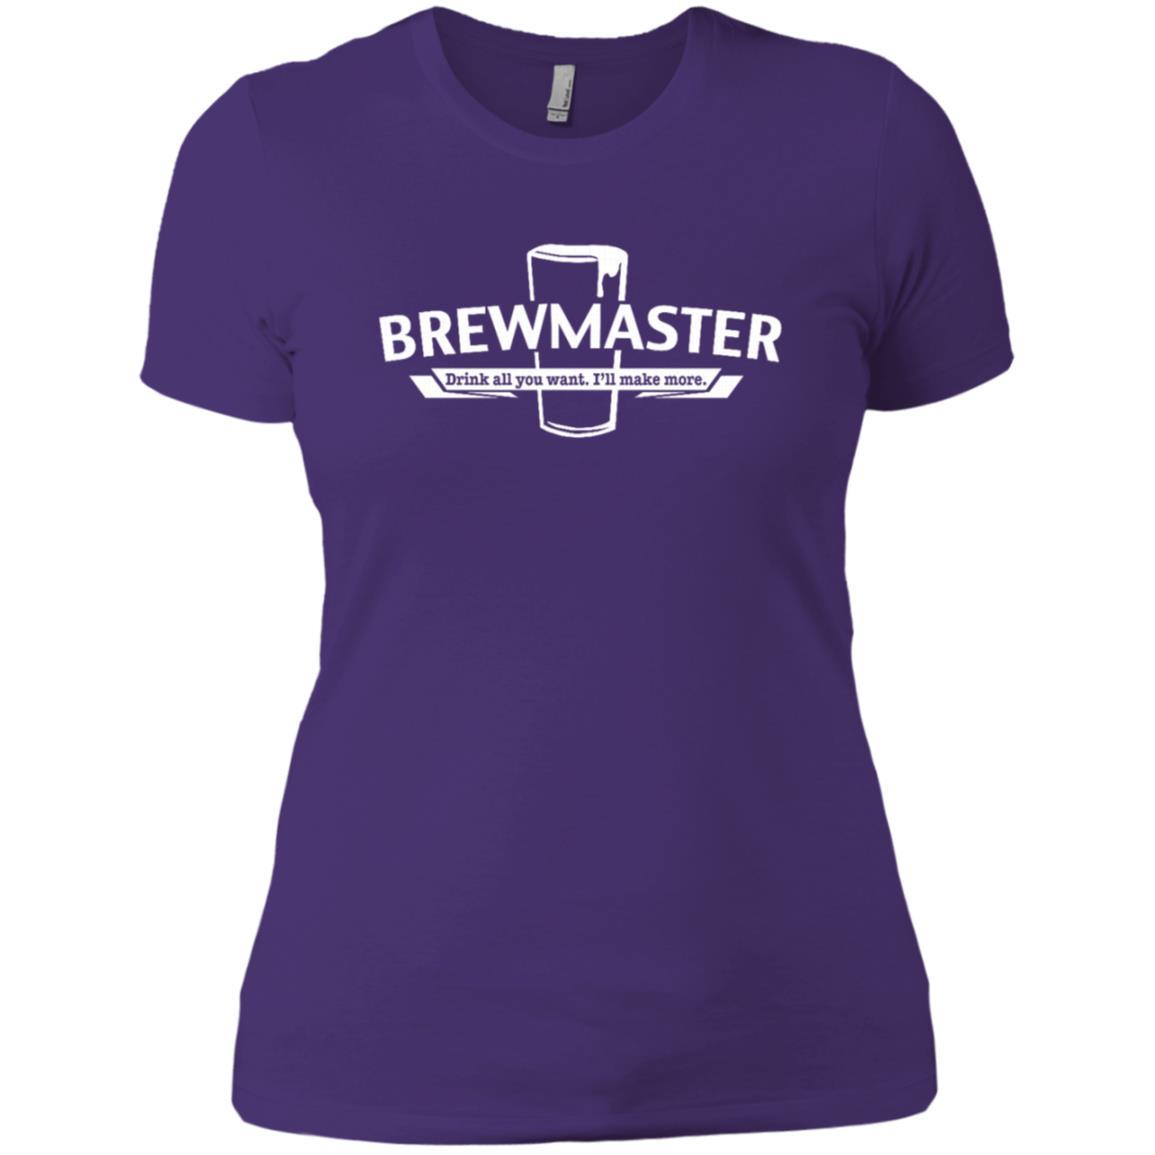 Brewmaster – Craft Beer Home Brewer Gift Tee Women Short Sleeve